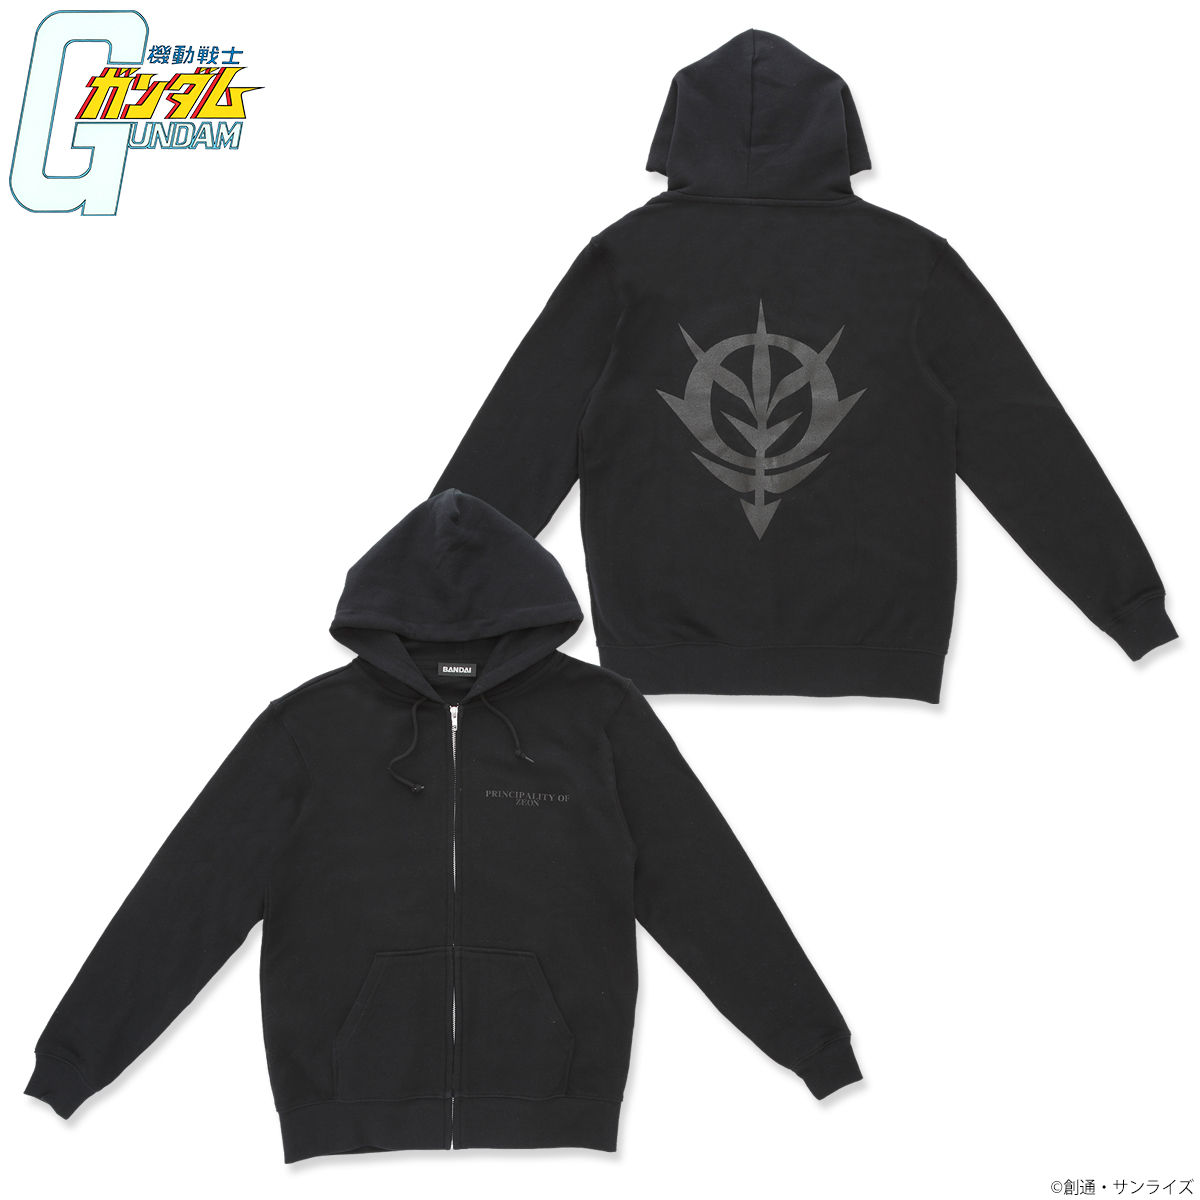 Mobile Suit Gundam Black Emblem Hoodie